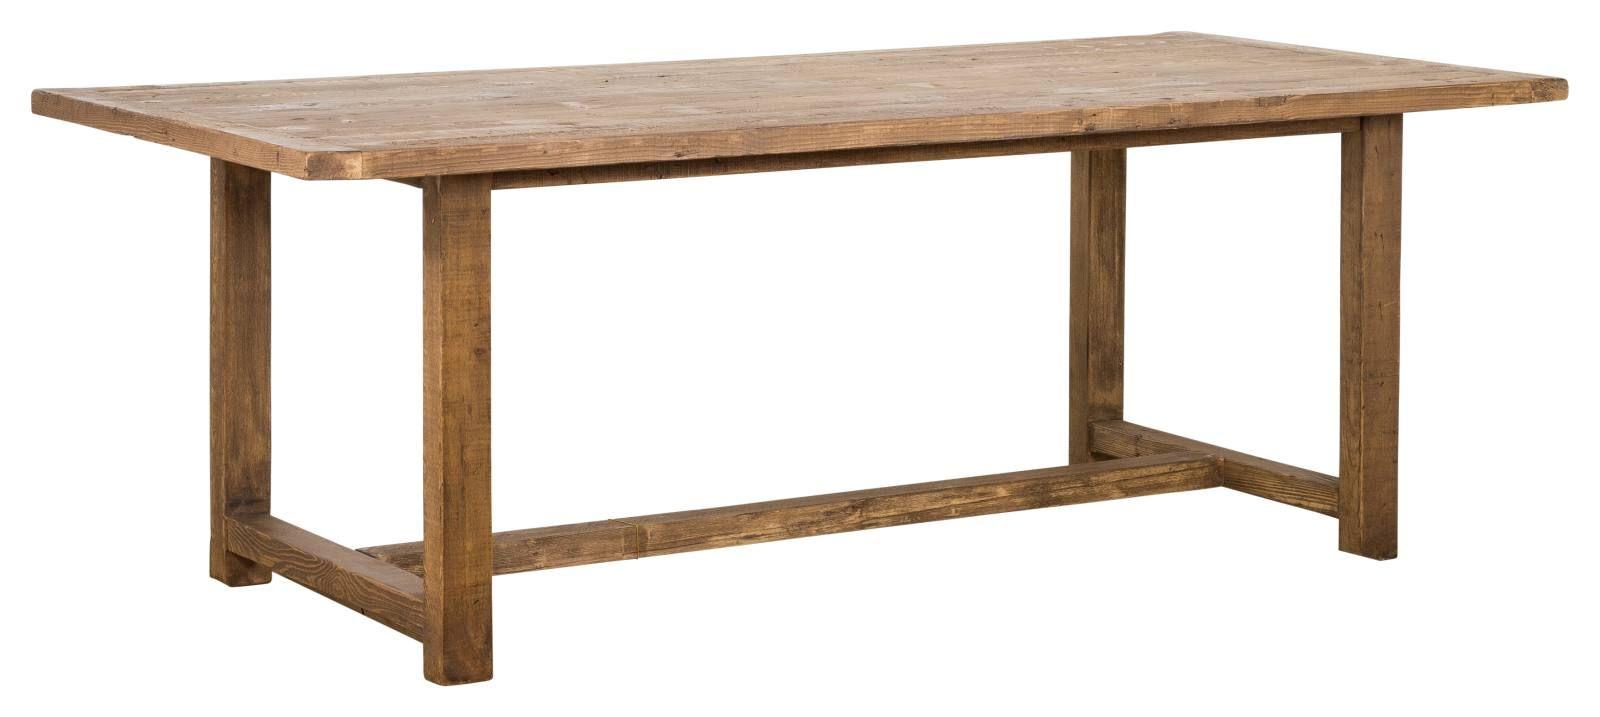 Landon Reclaimed Pine Dining Table Natural With Images Reclaimed Pine Dining Table Pine Dining Table Teak Dining Table